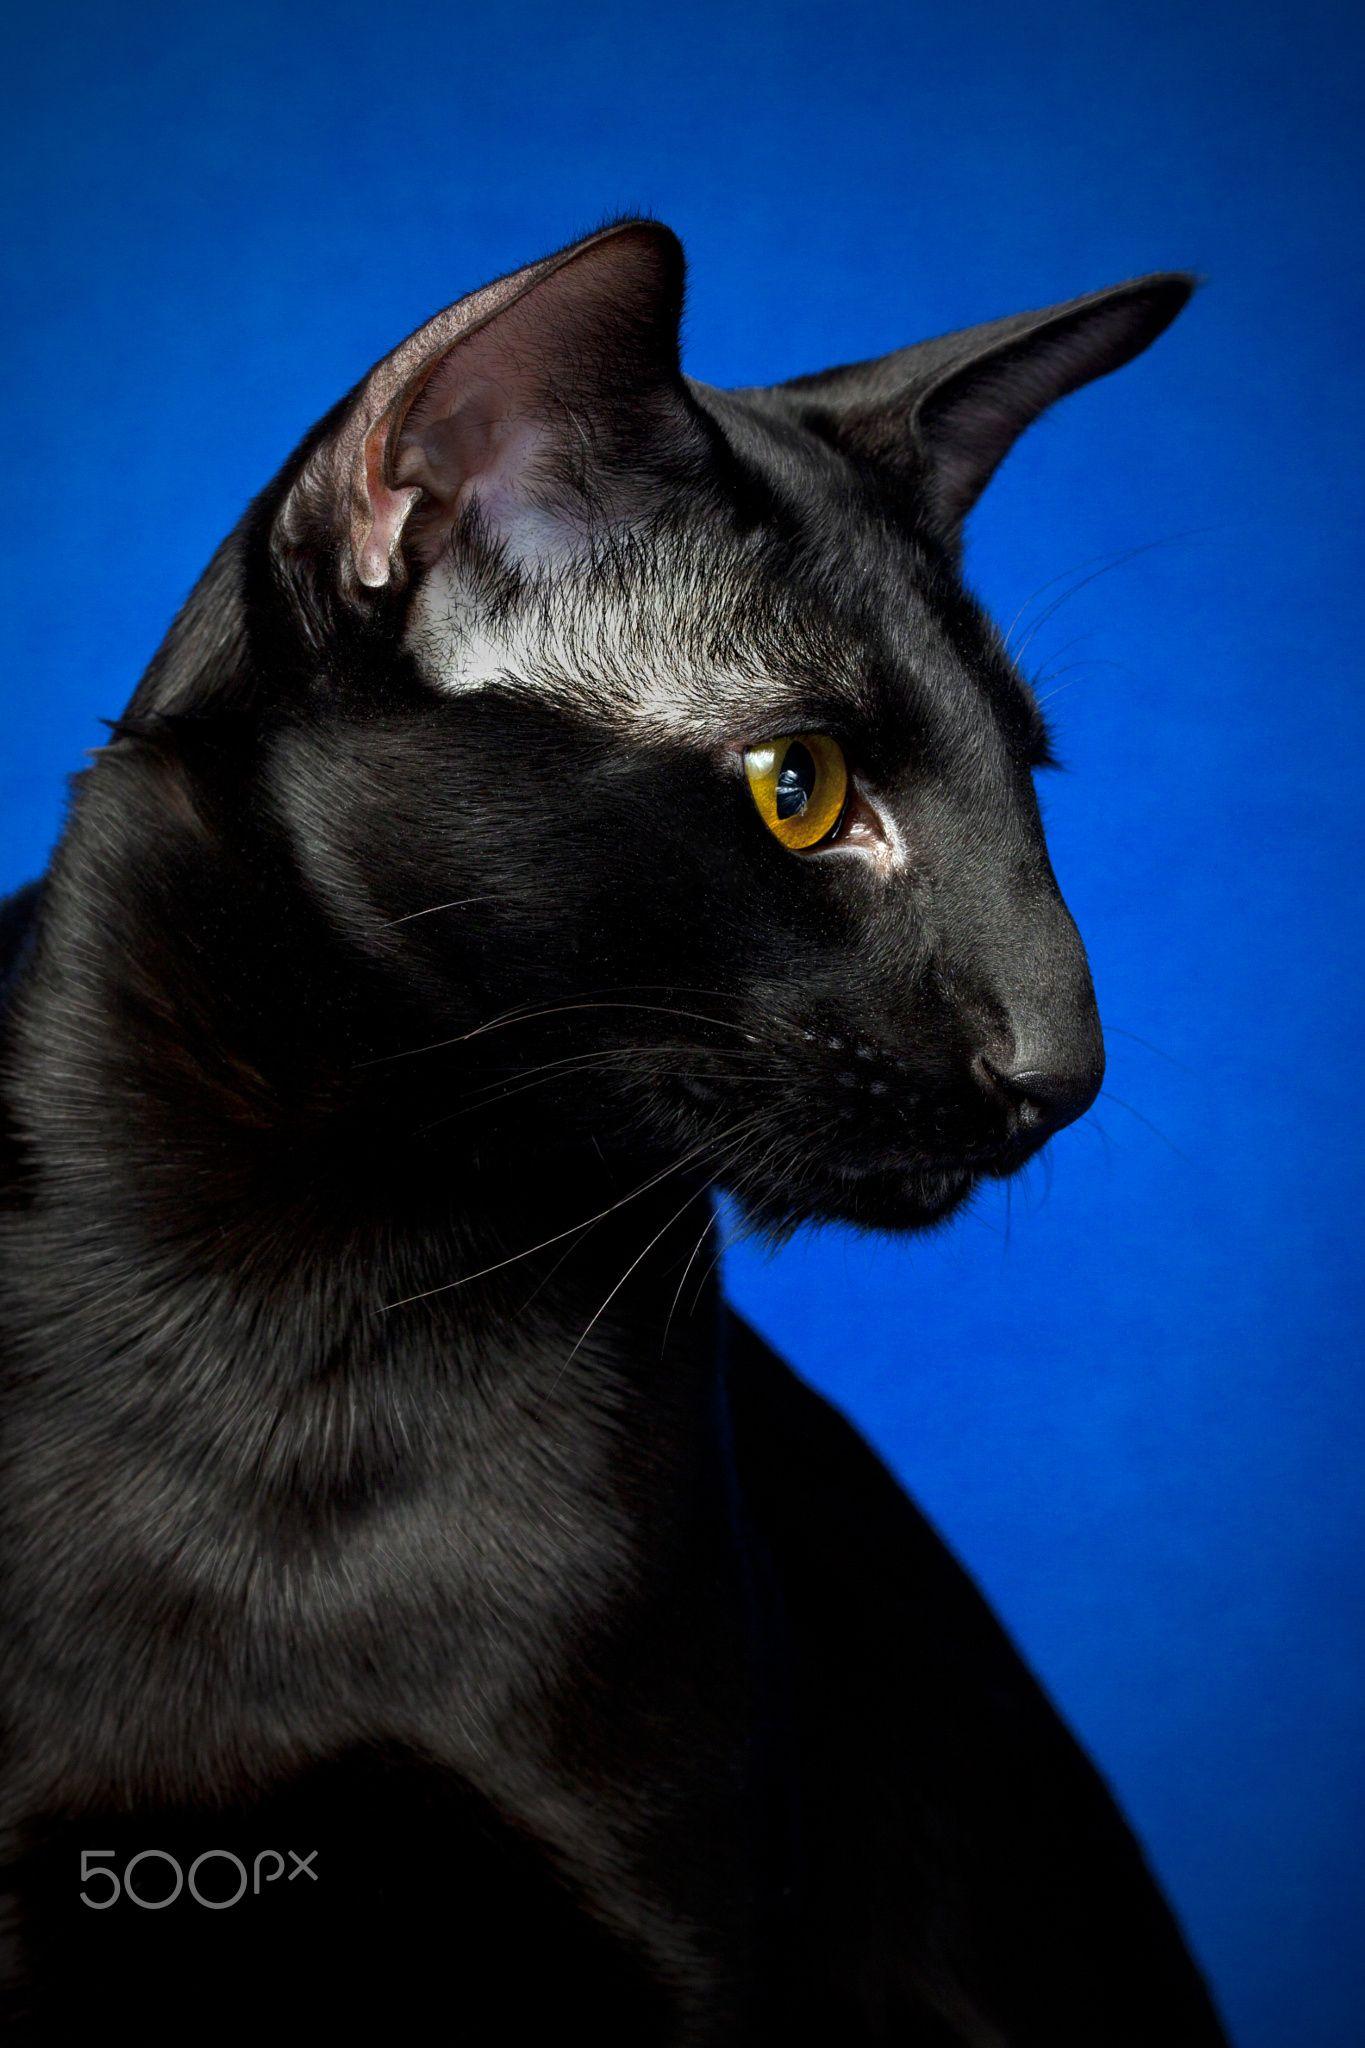 Beautiful black cat ️ Cats and kittens, Dog cat